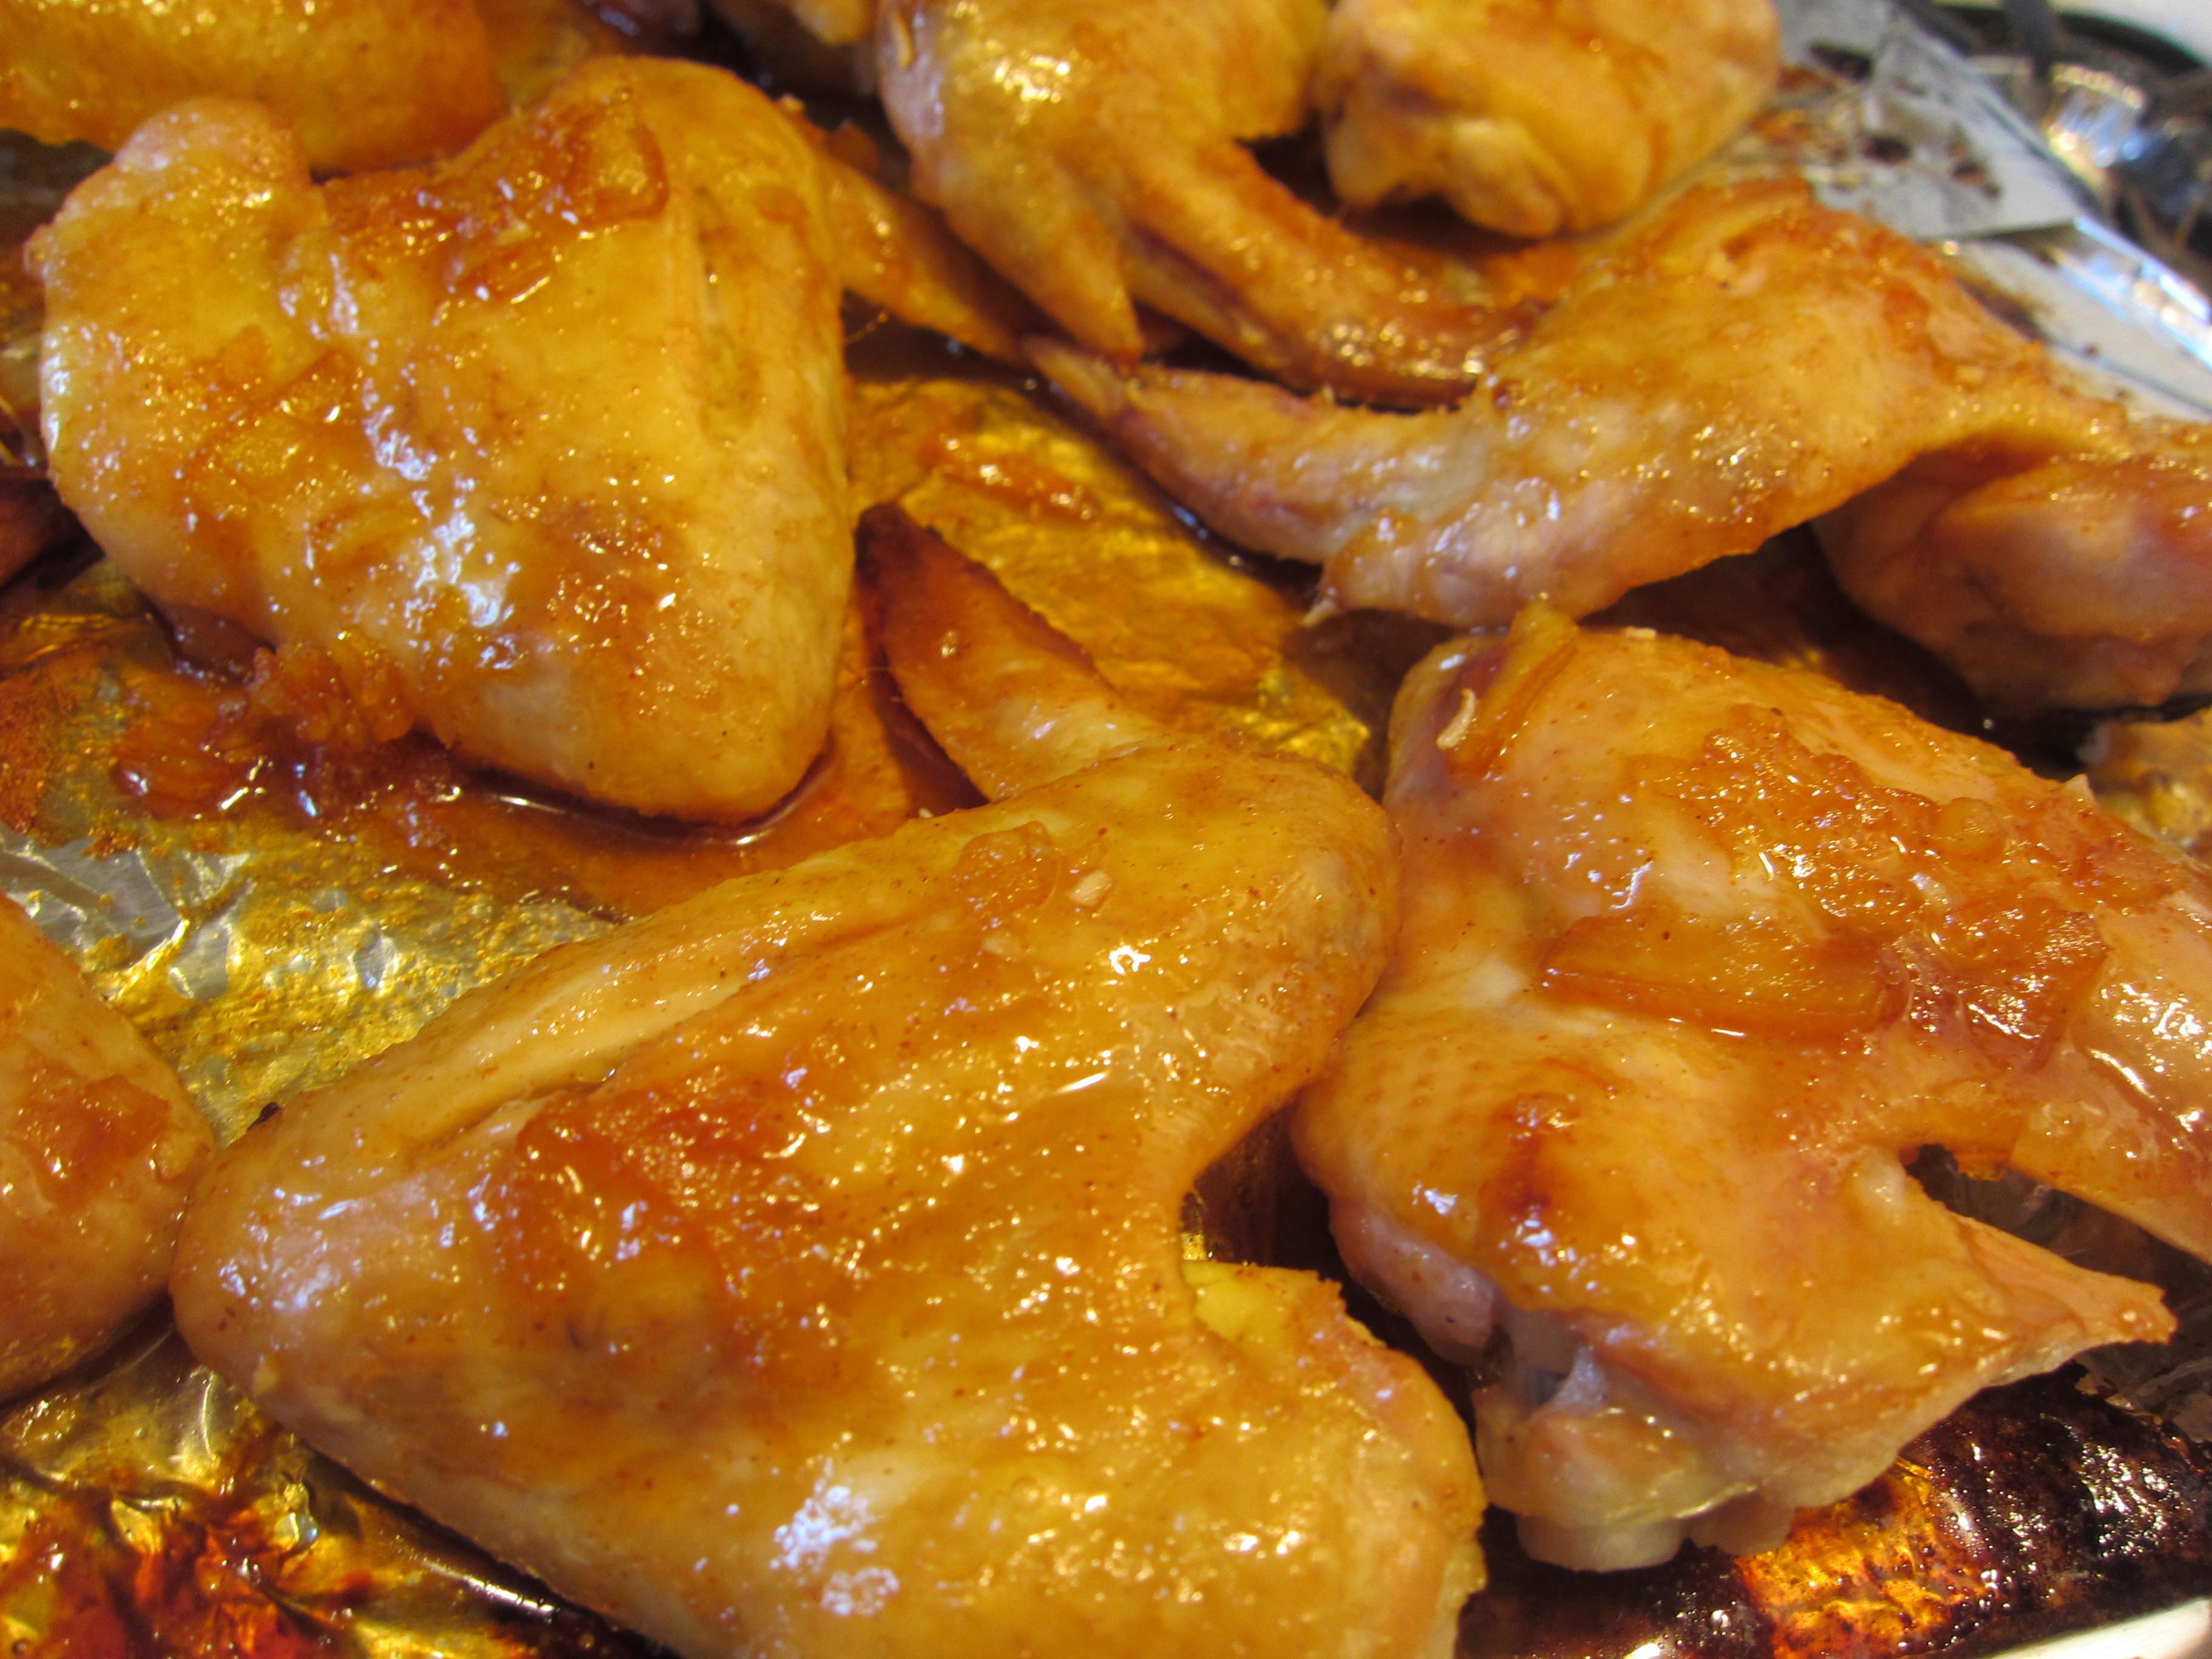 What You Need 12 Chicken Wings Orange Marmalade 2 Tbs Scoop Brown Sugar 2 Tbs Scoop Honey 1 Tbs Salt 1 2 Ts Soy Sauce 2 3 Tbs Vinegar 3 Tbs